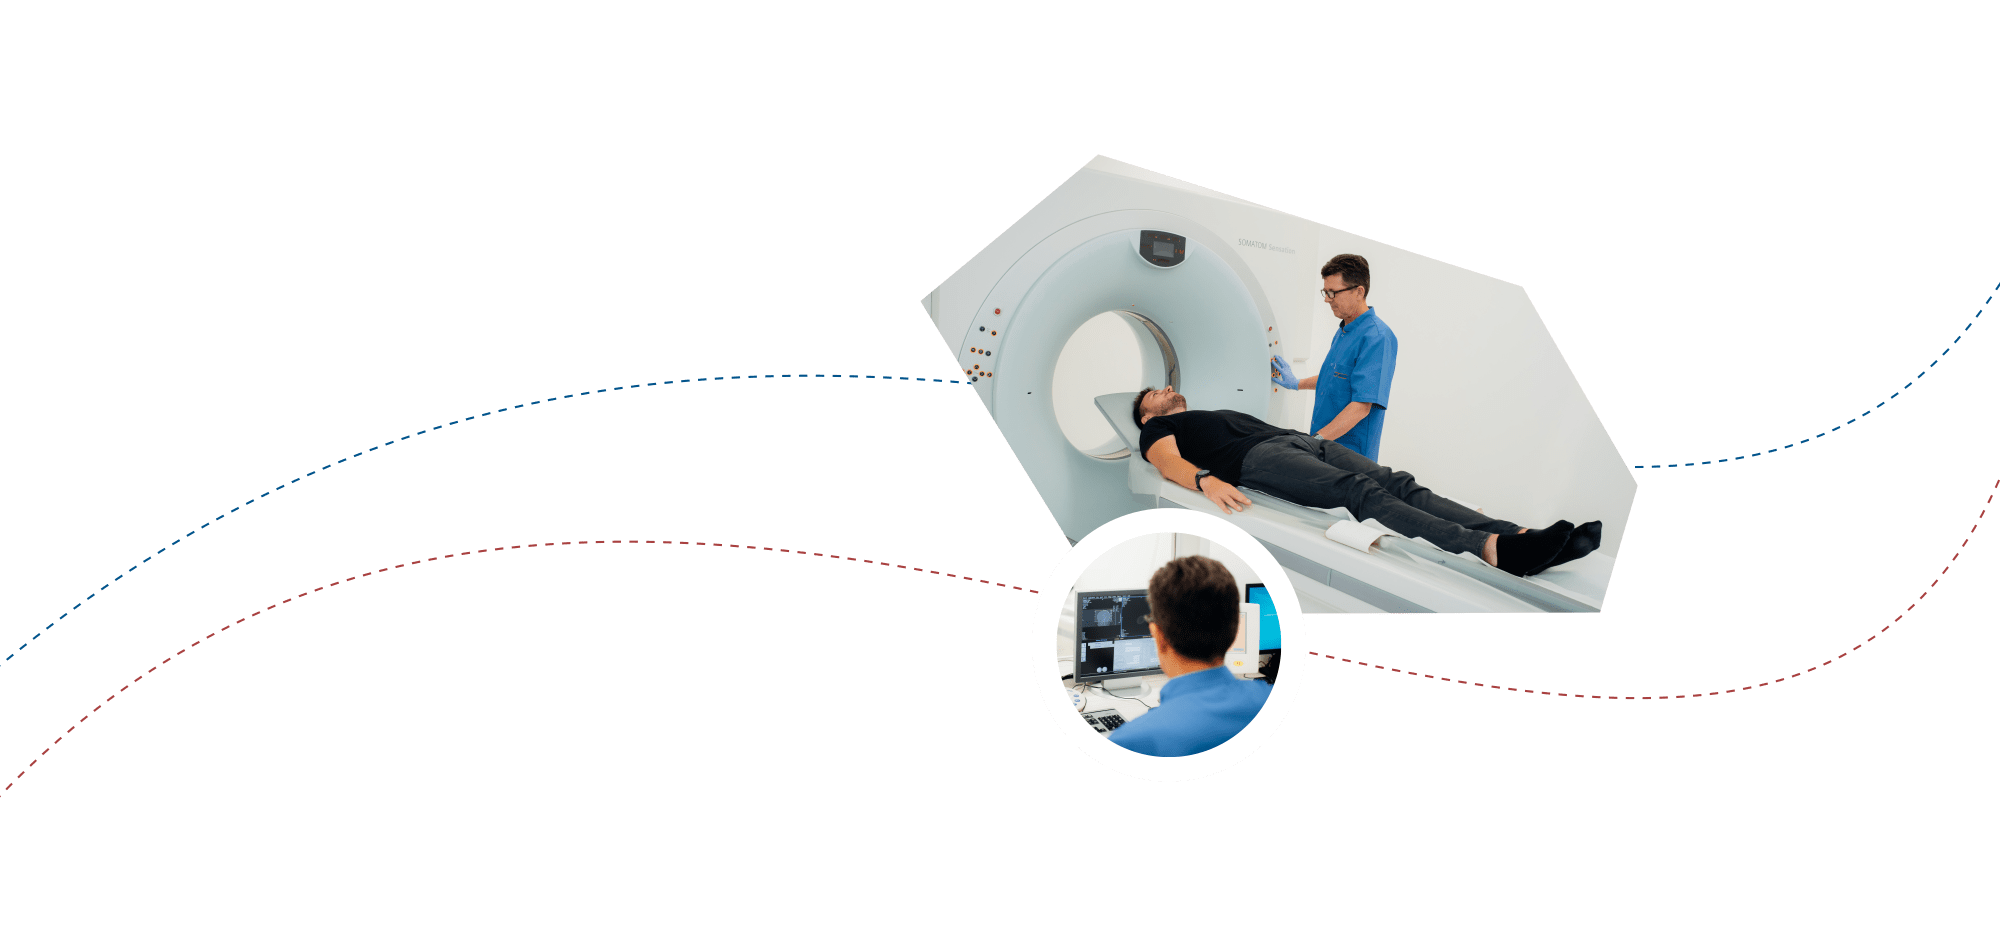 tomografia komputerowa lublin